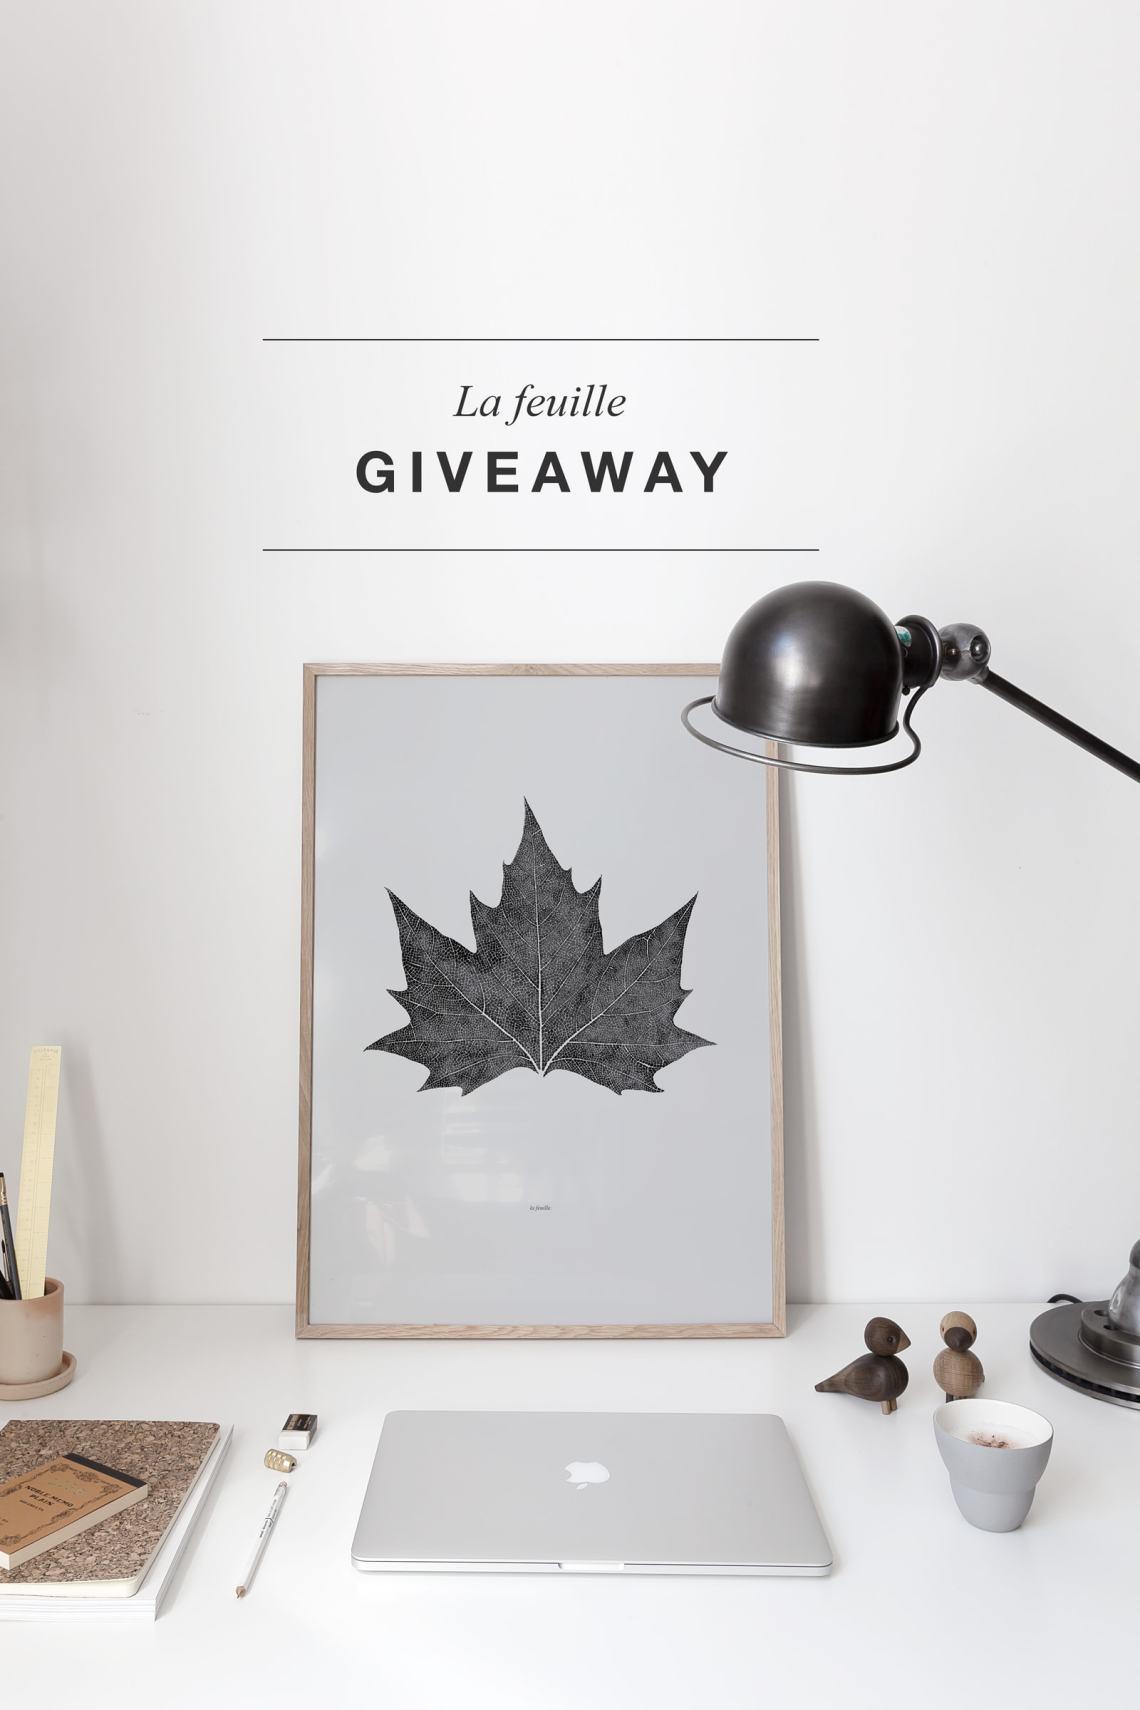 La Feuille giveaway on Instagram - via Coco Lapine Design blog